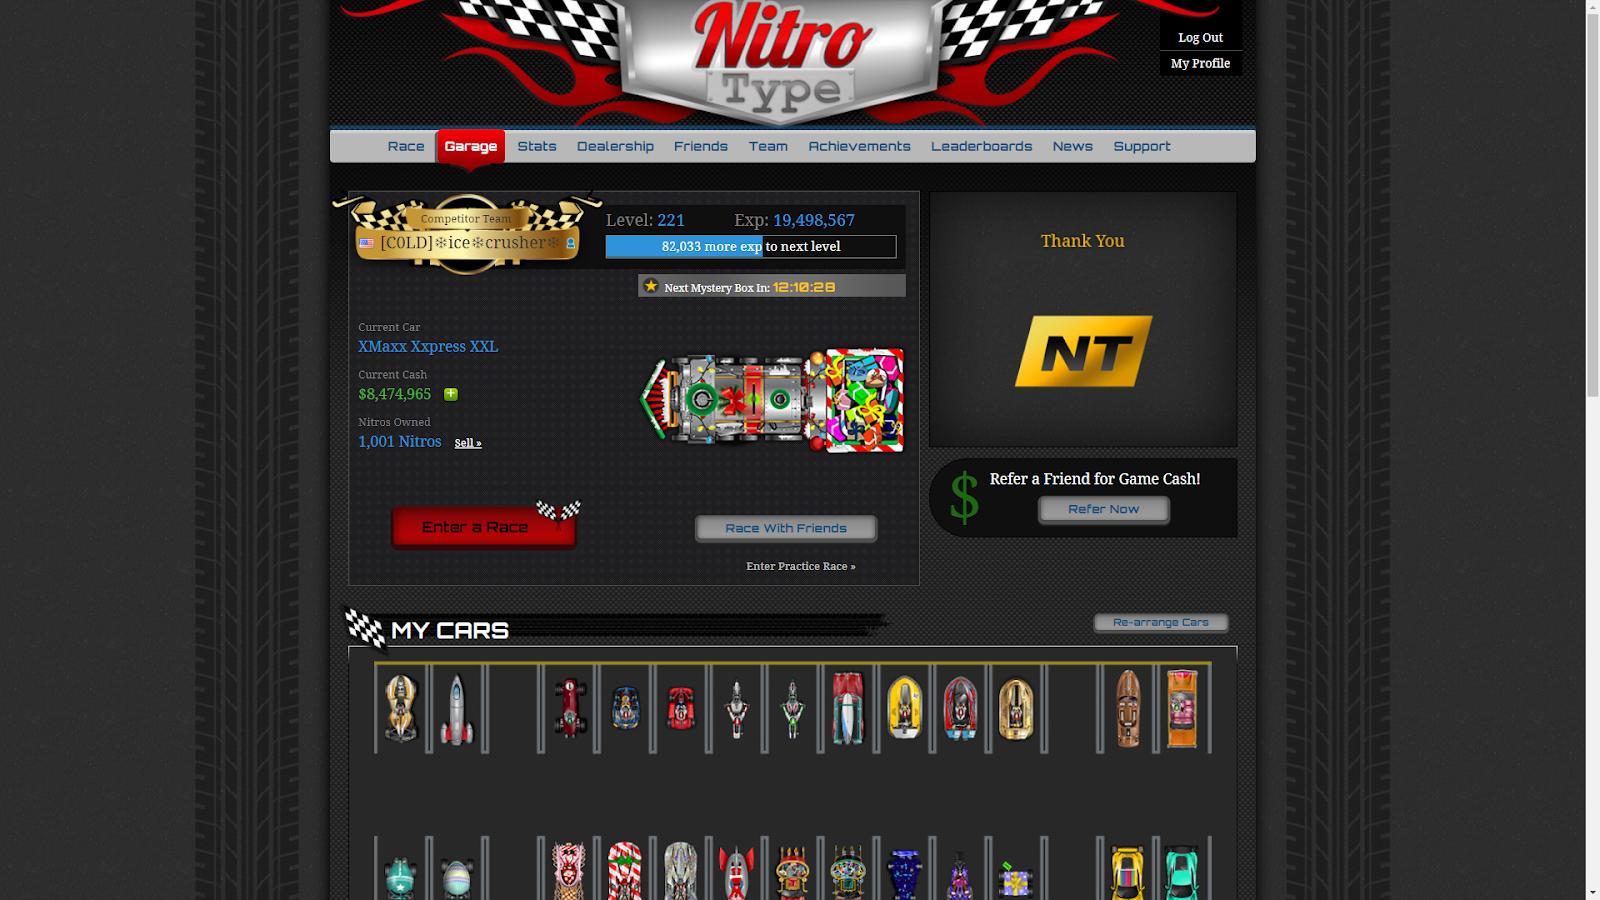 Nitro type race garage sales